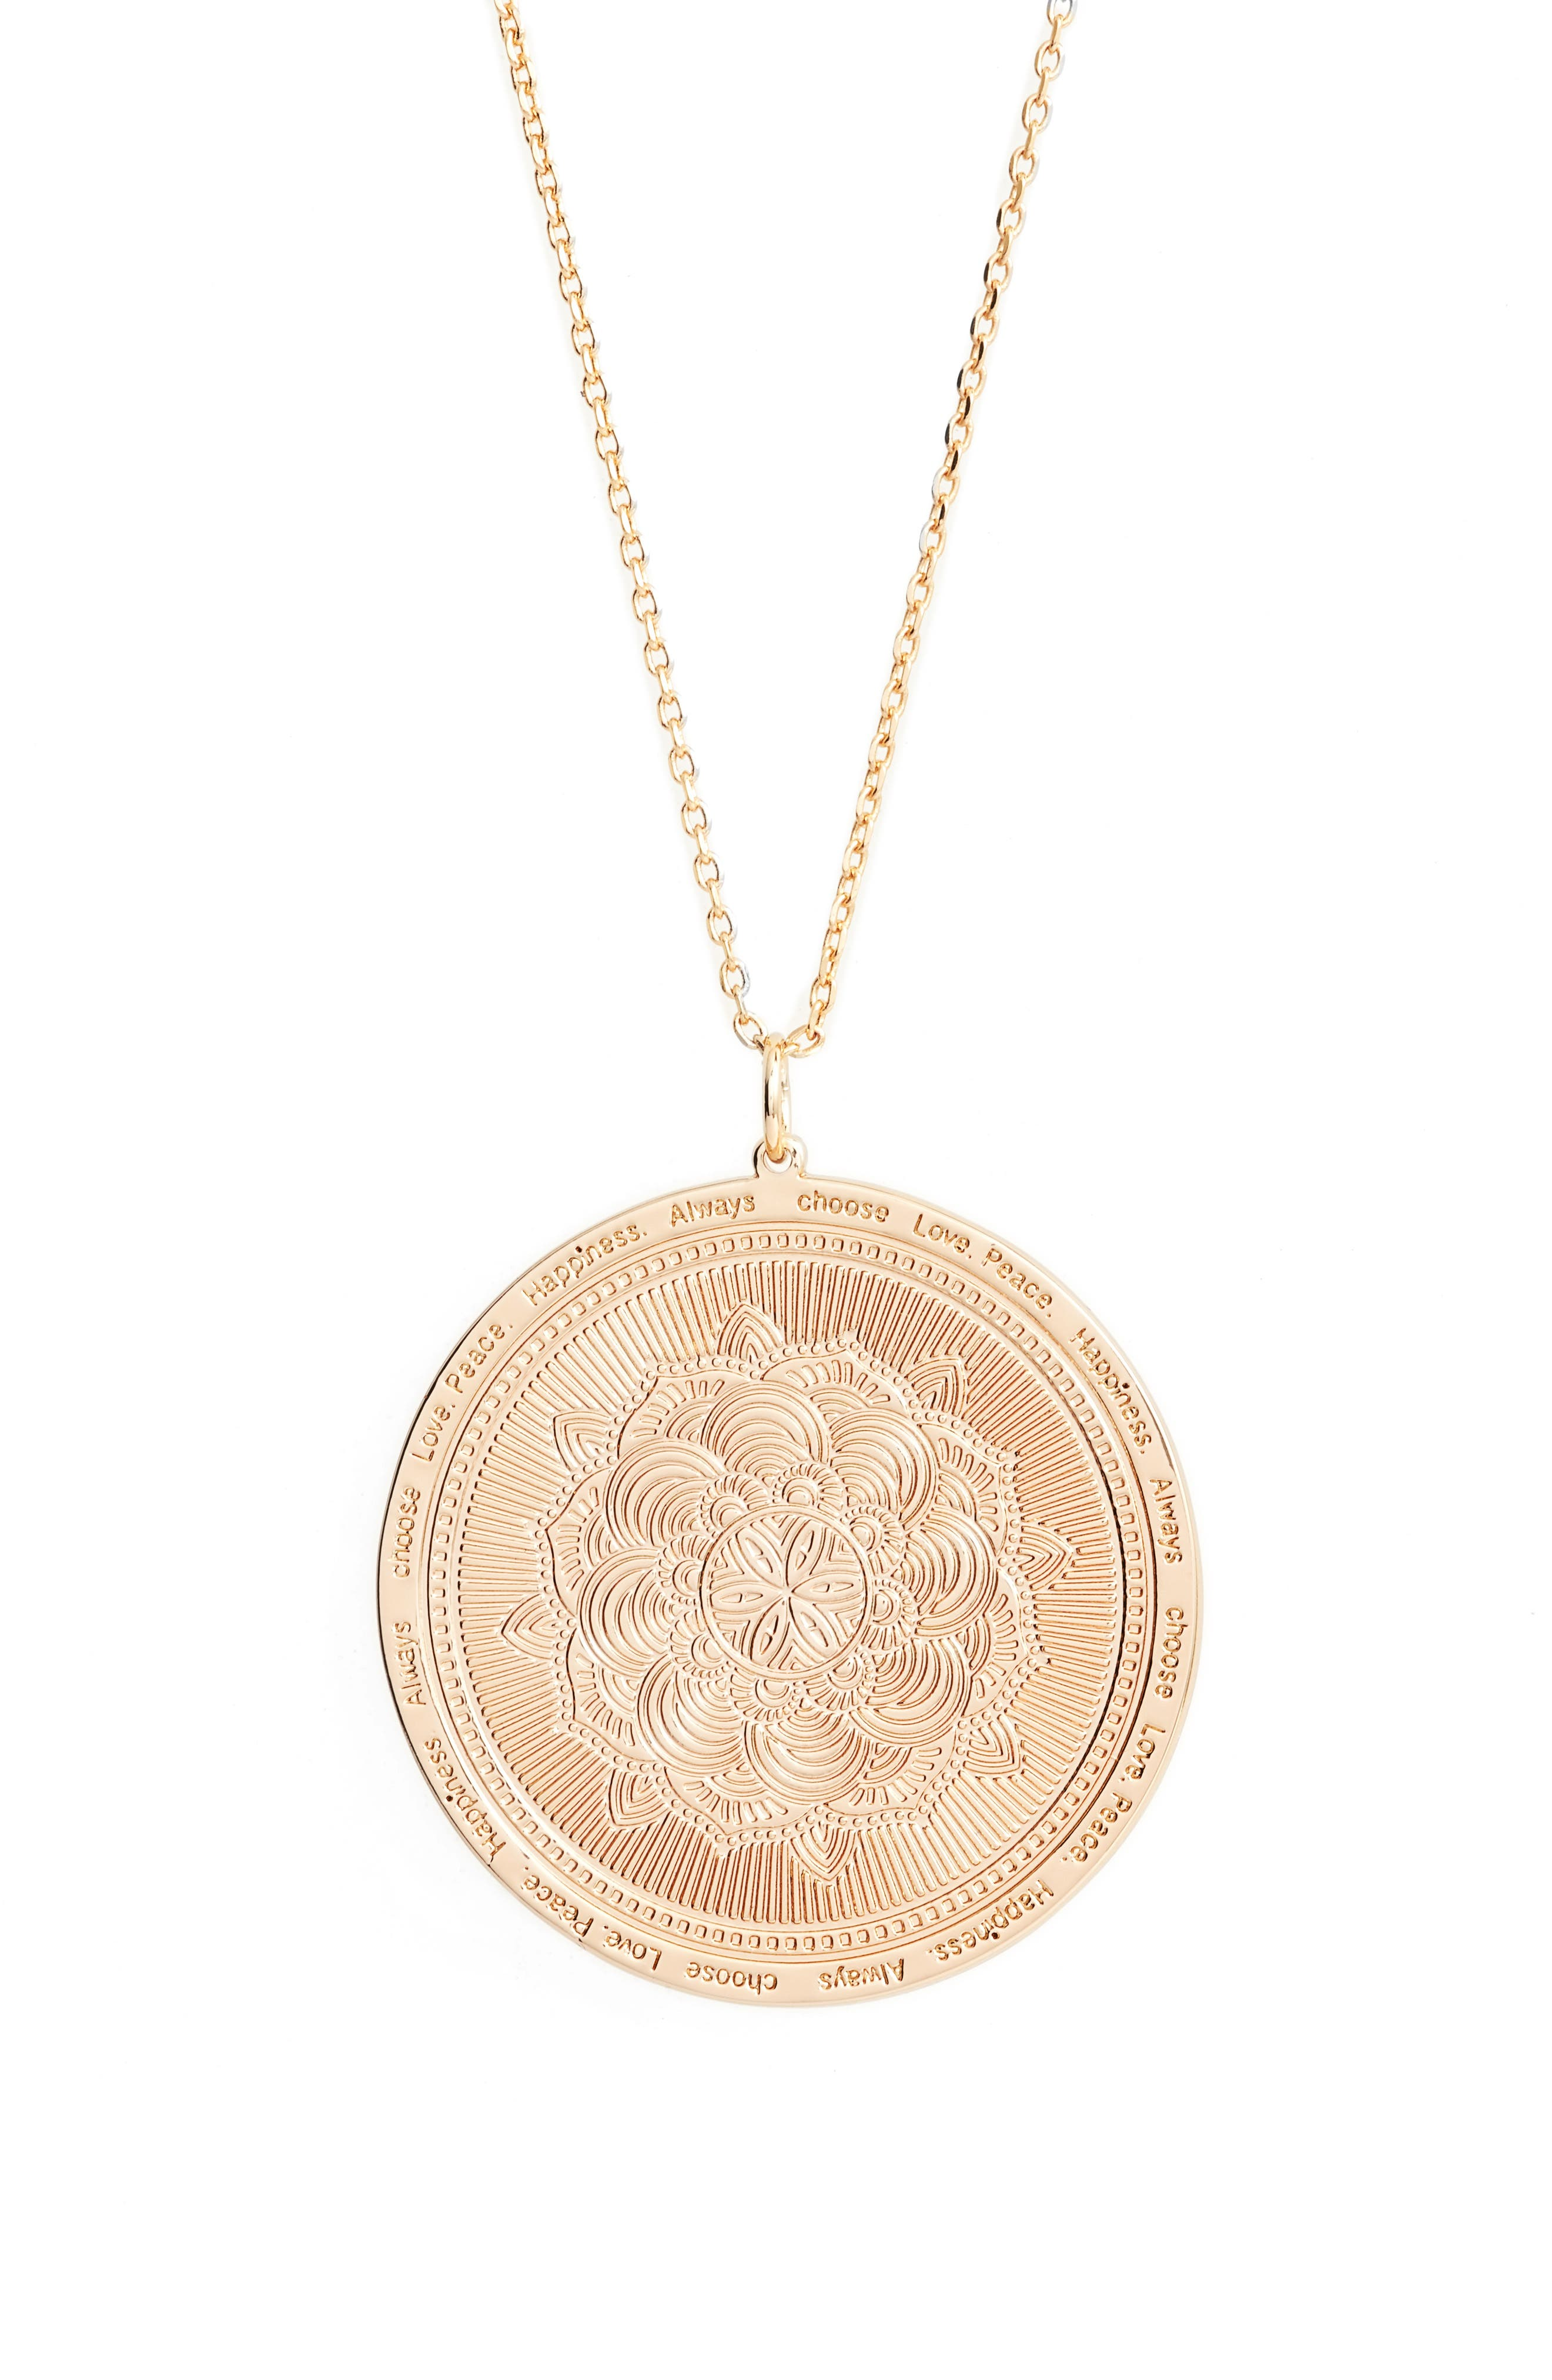 Always Choose Love Pendant Necklace,                         Main,                         color, Rose Gold